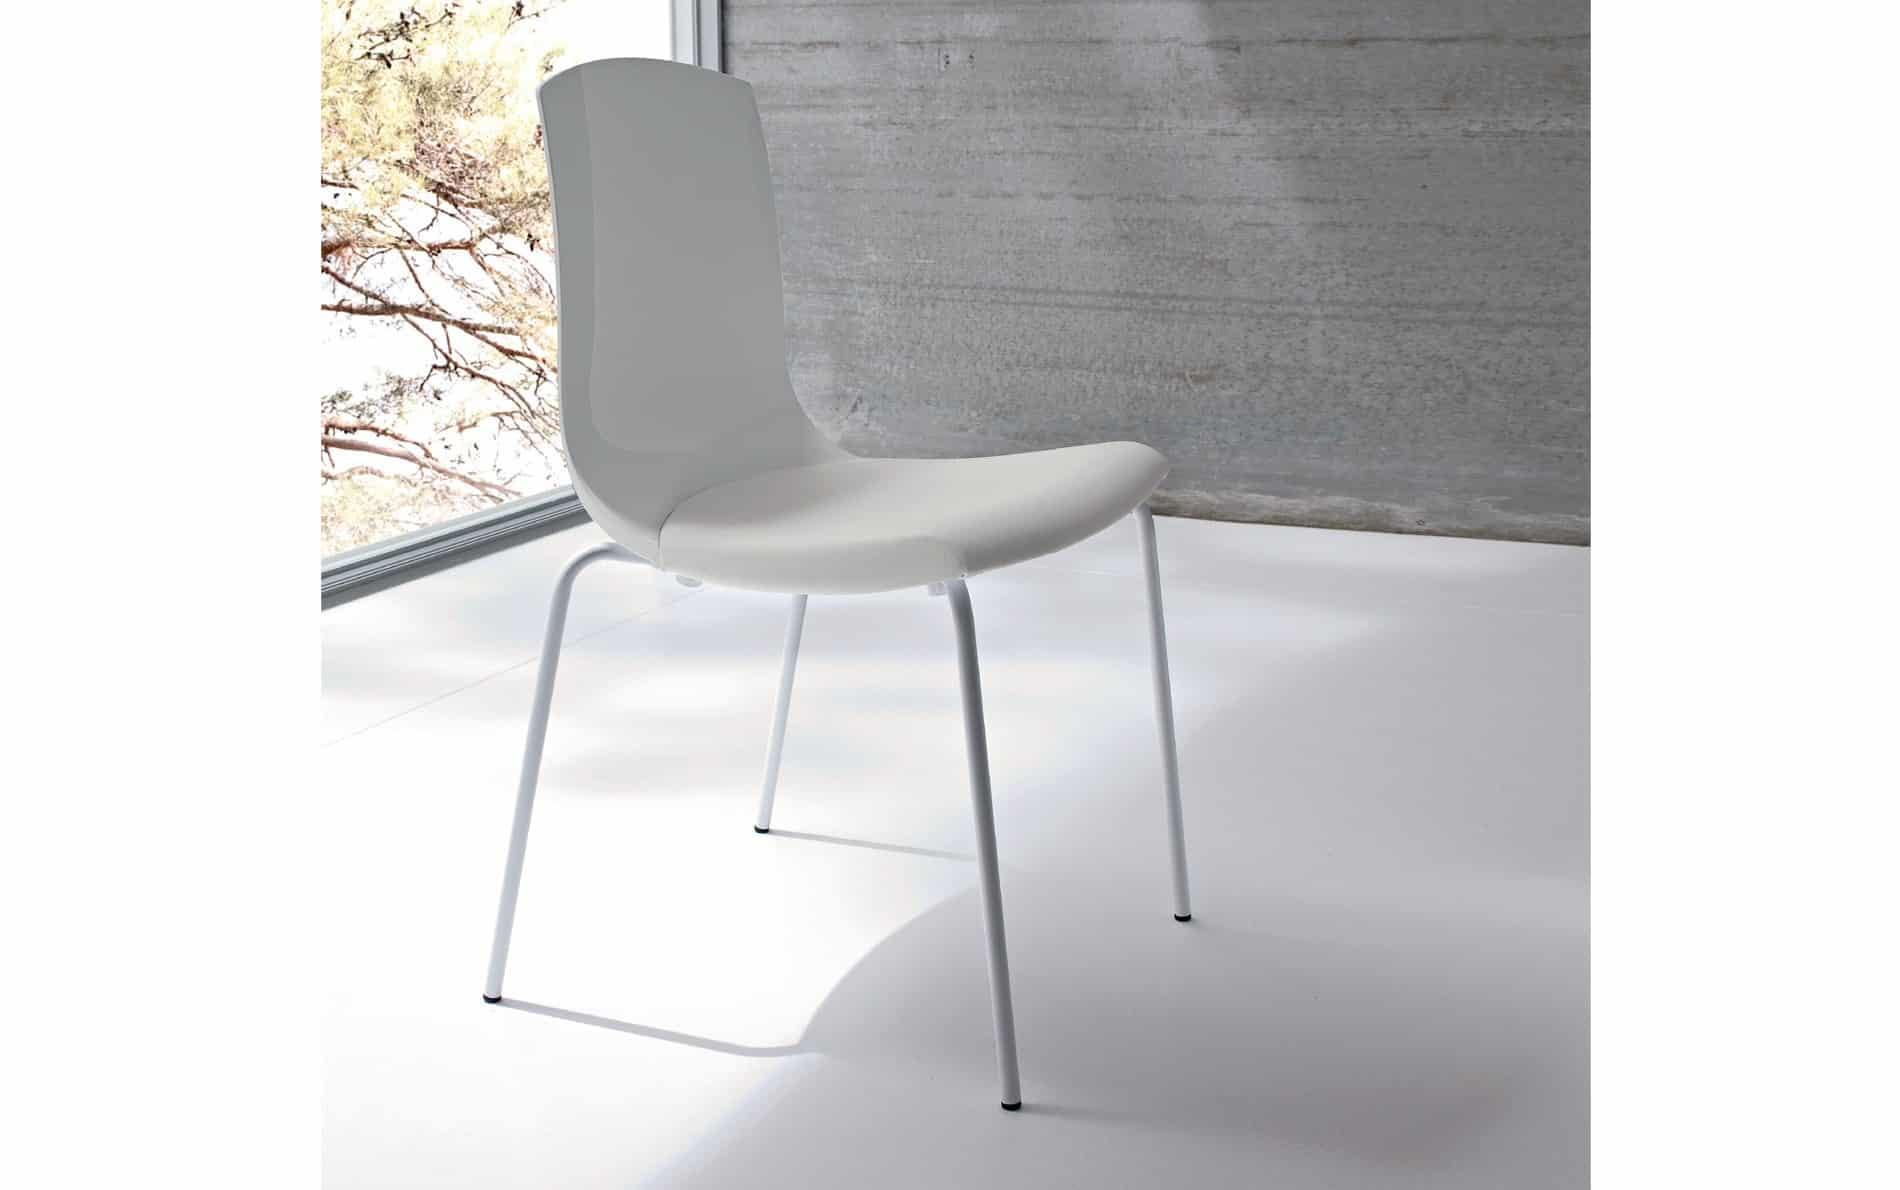 Sedit design stuhl smile transparent hochglanz for Stuhl design weiss